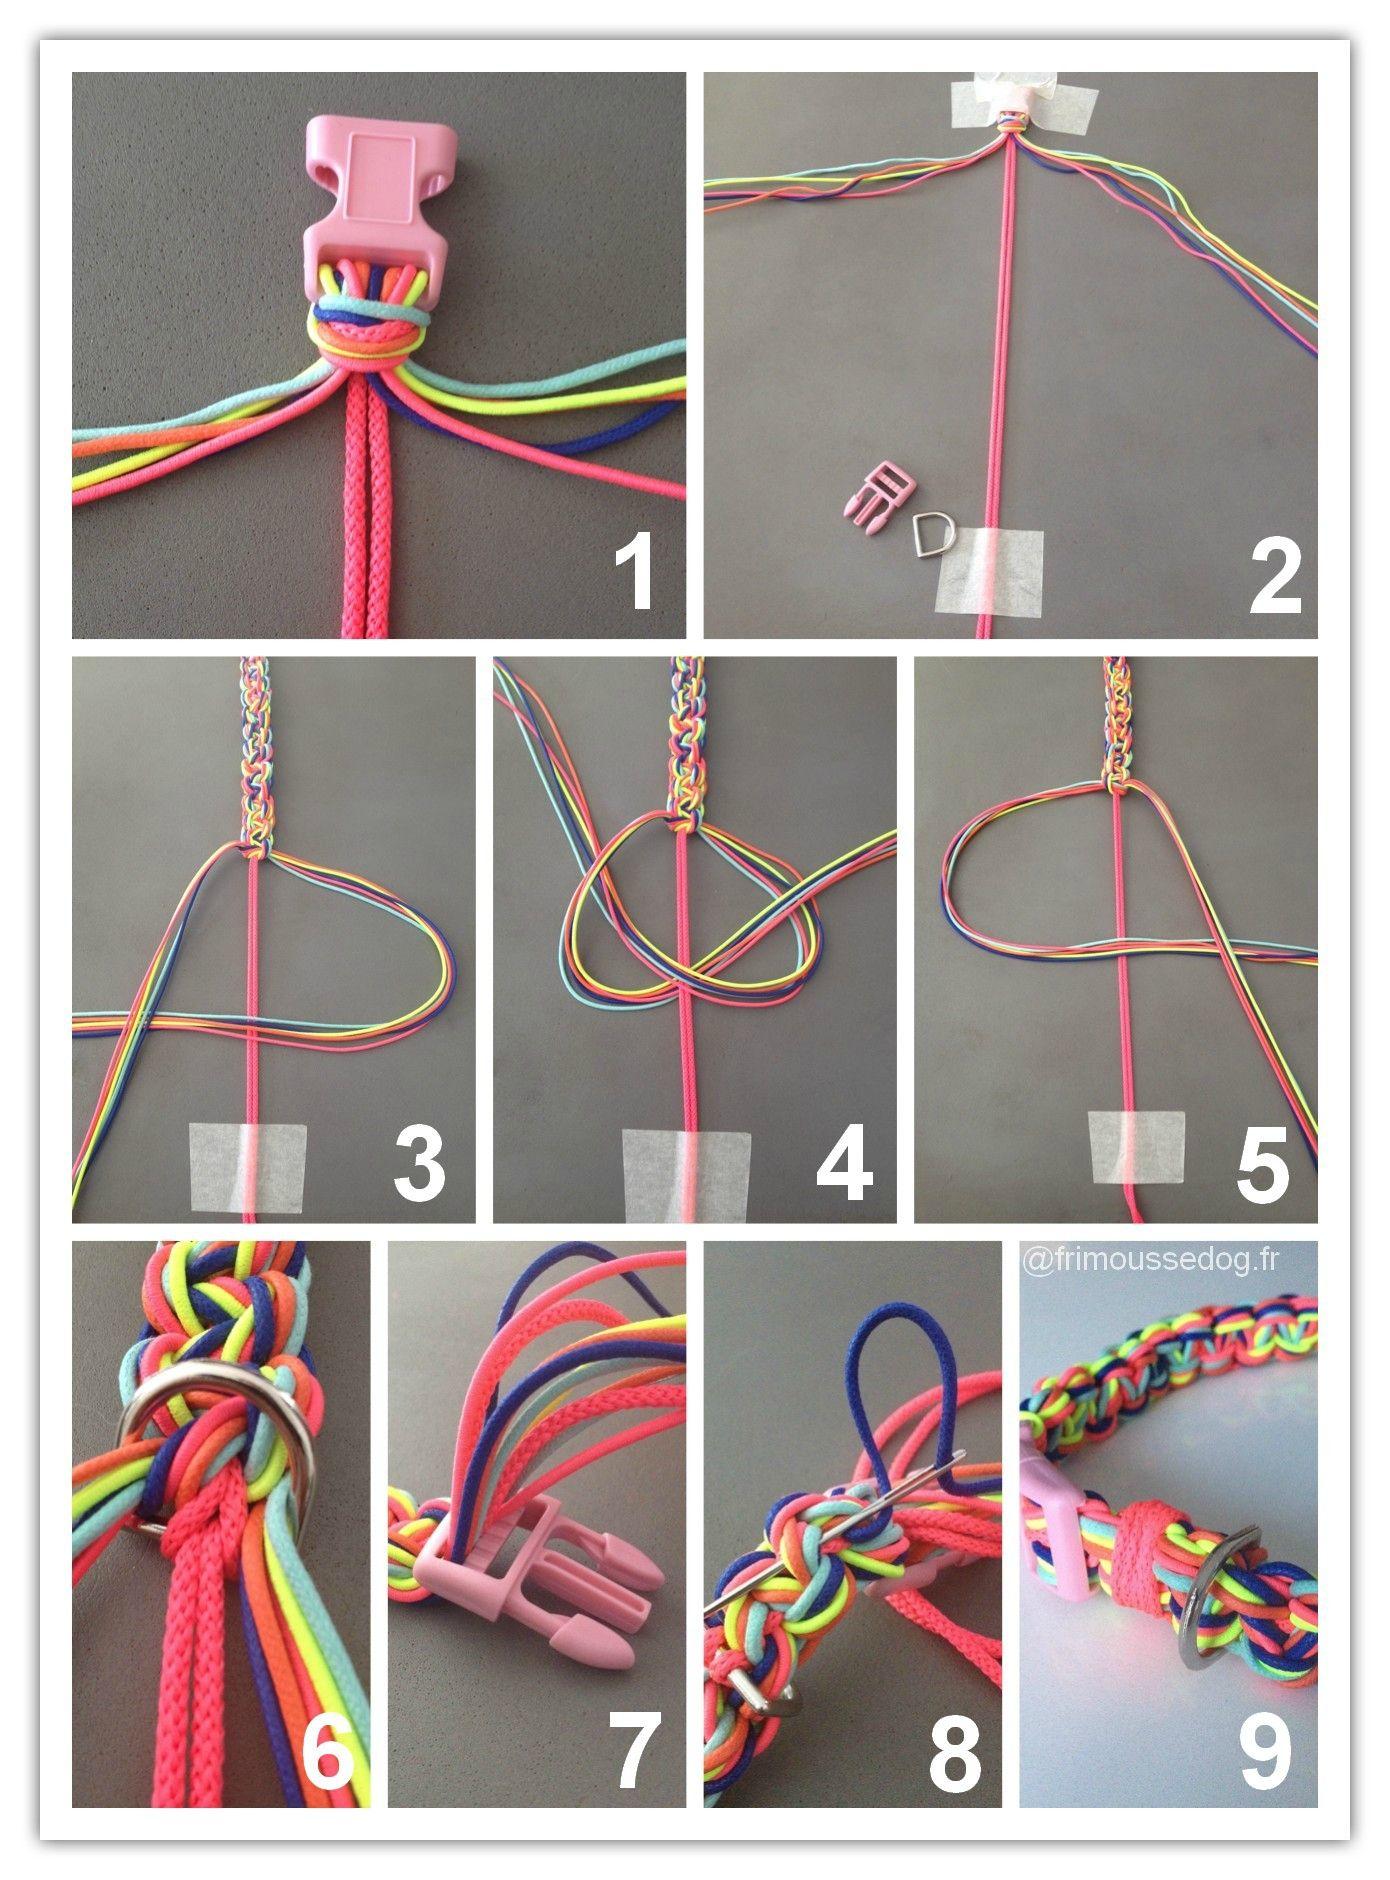 tuto collier chien - Recherche Google   Consignment Crafts   Diy dog collar, Dogs, Diy dog toys